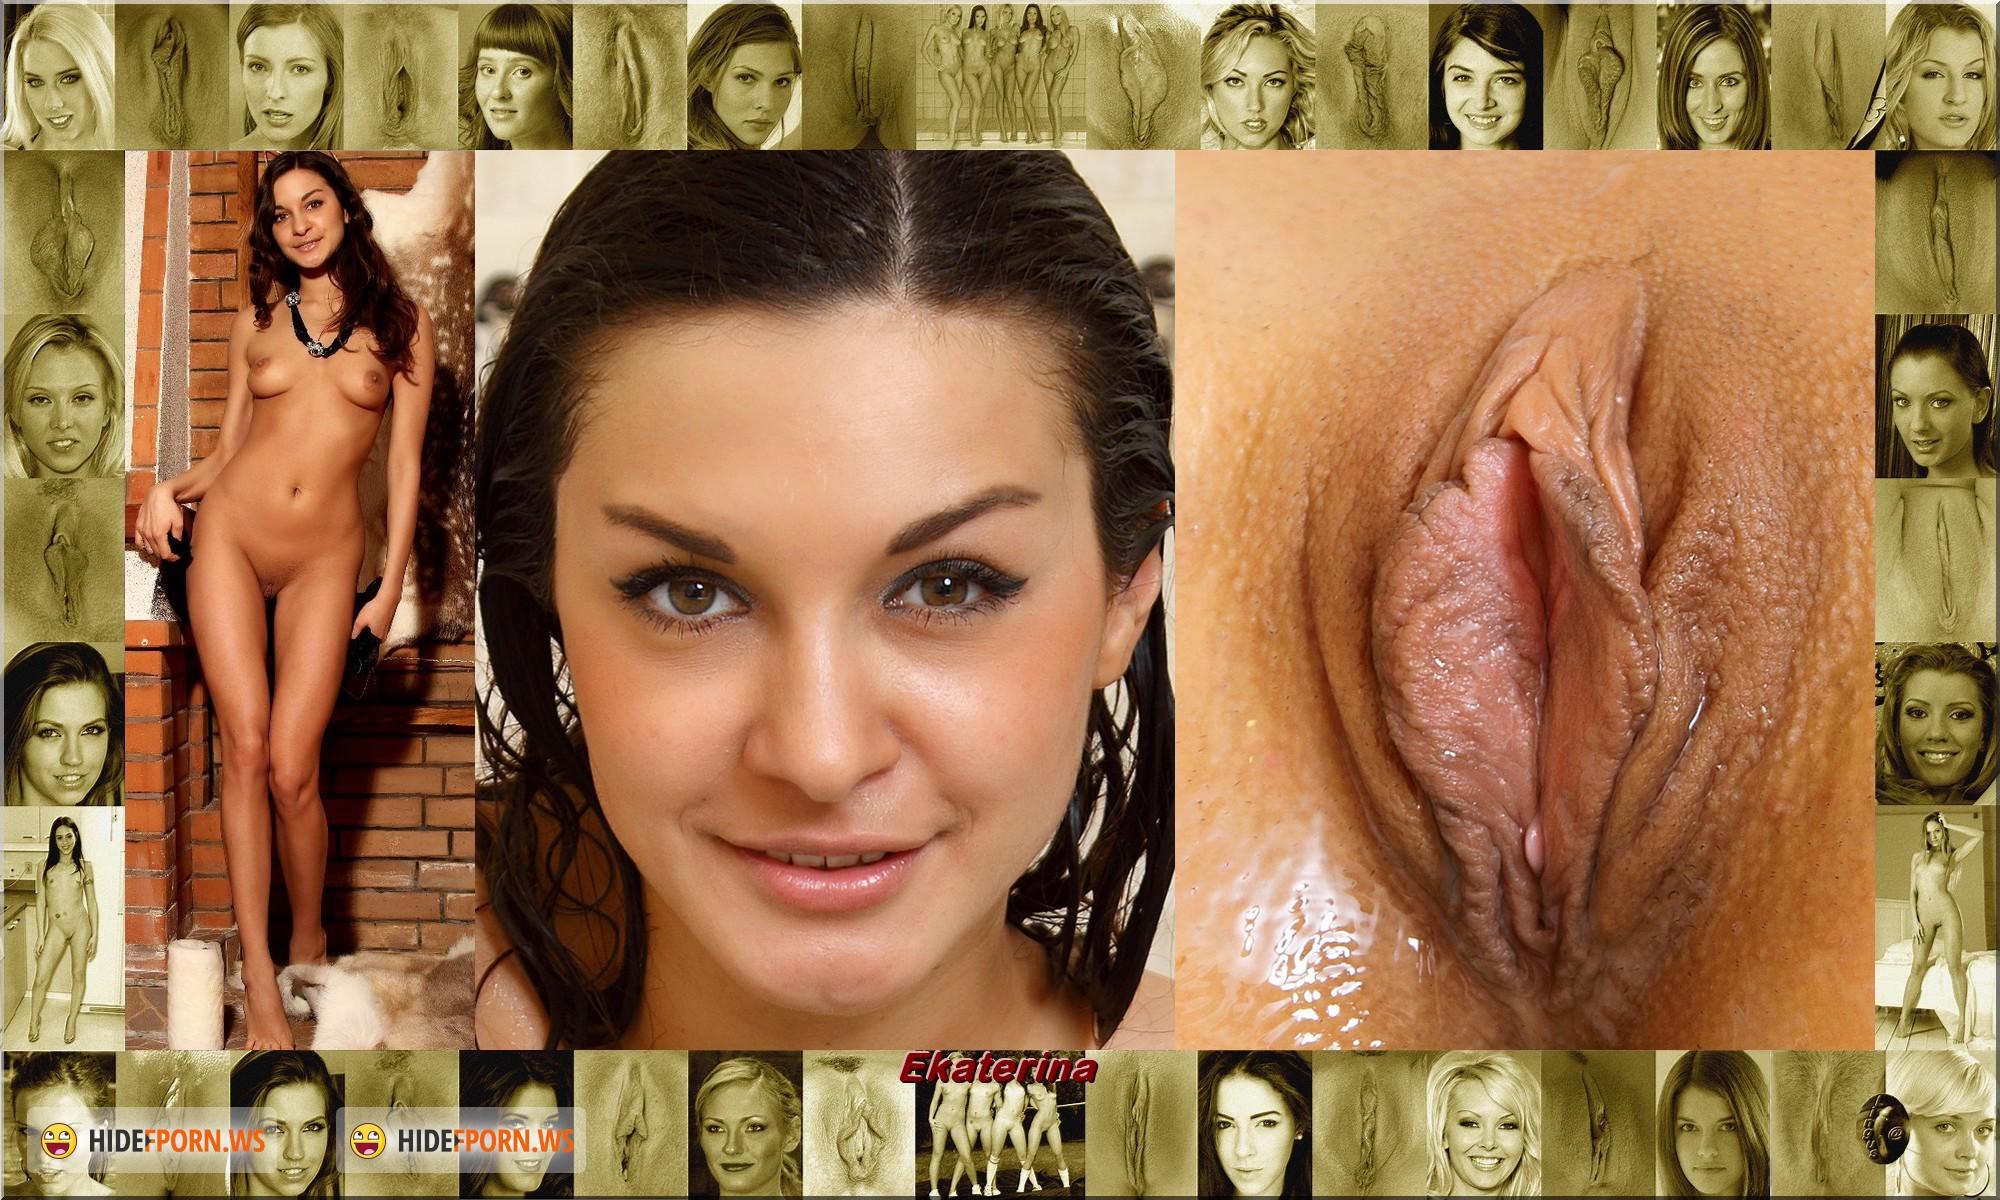 Dirty old lesbian pics